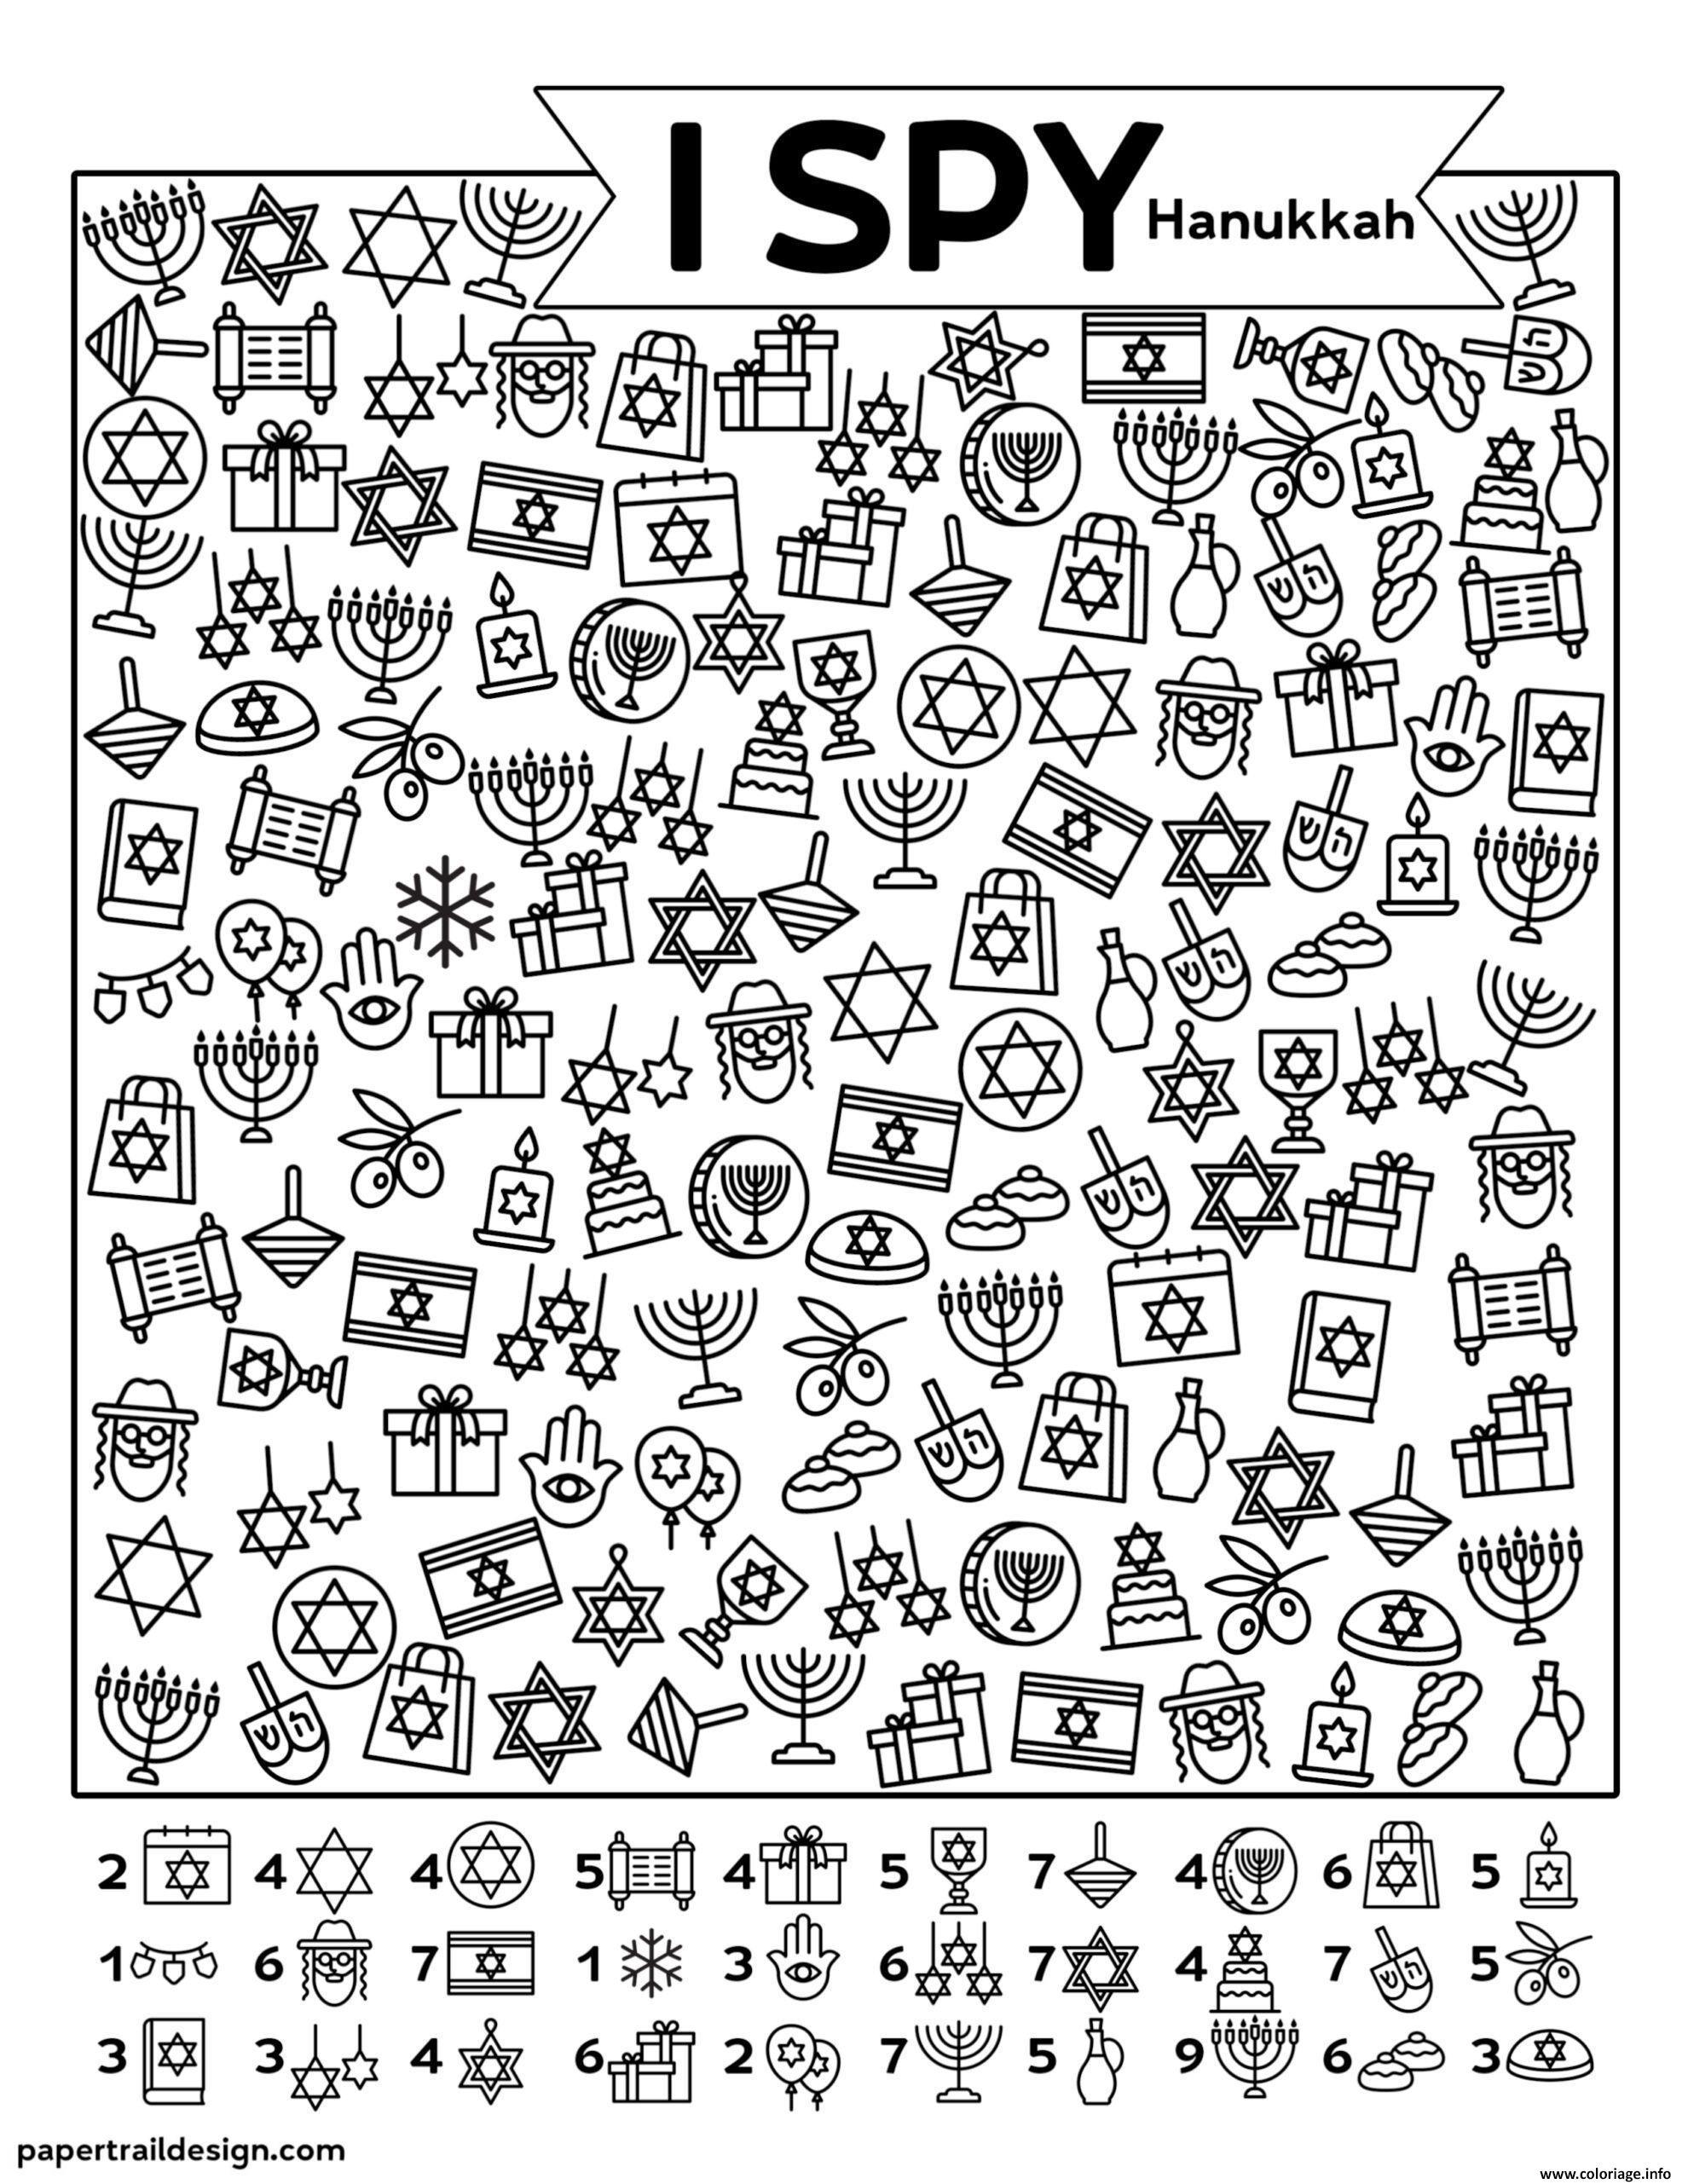 Dessin I Spy Hanukkah Coloriage Gratuit à Imprimer